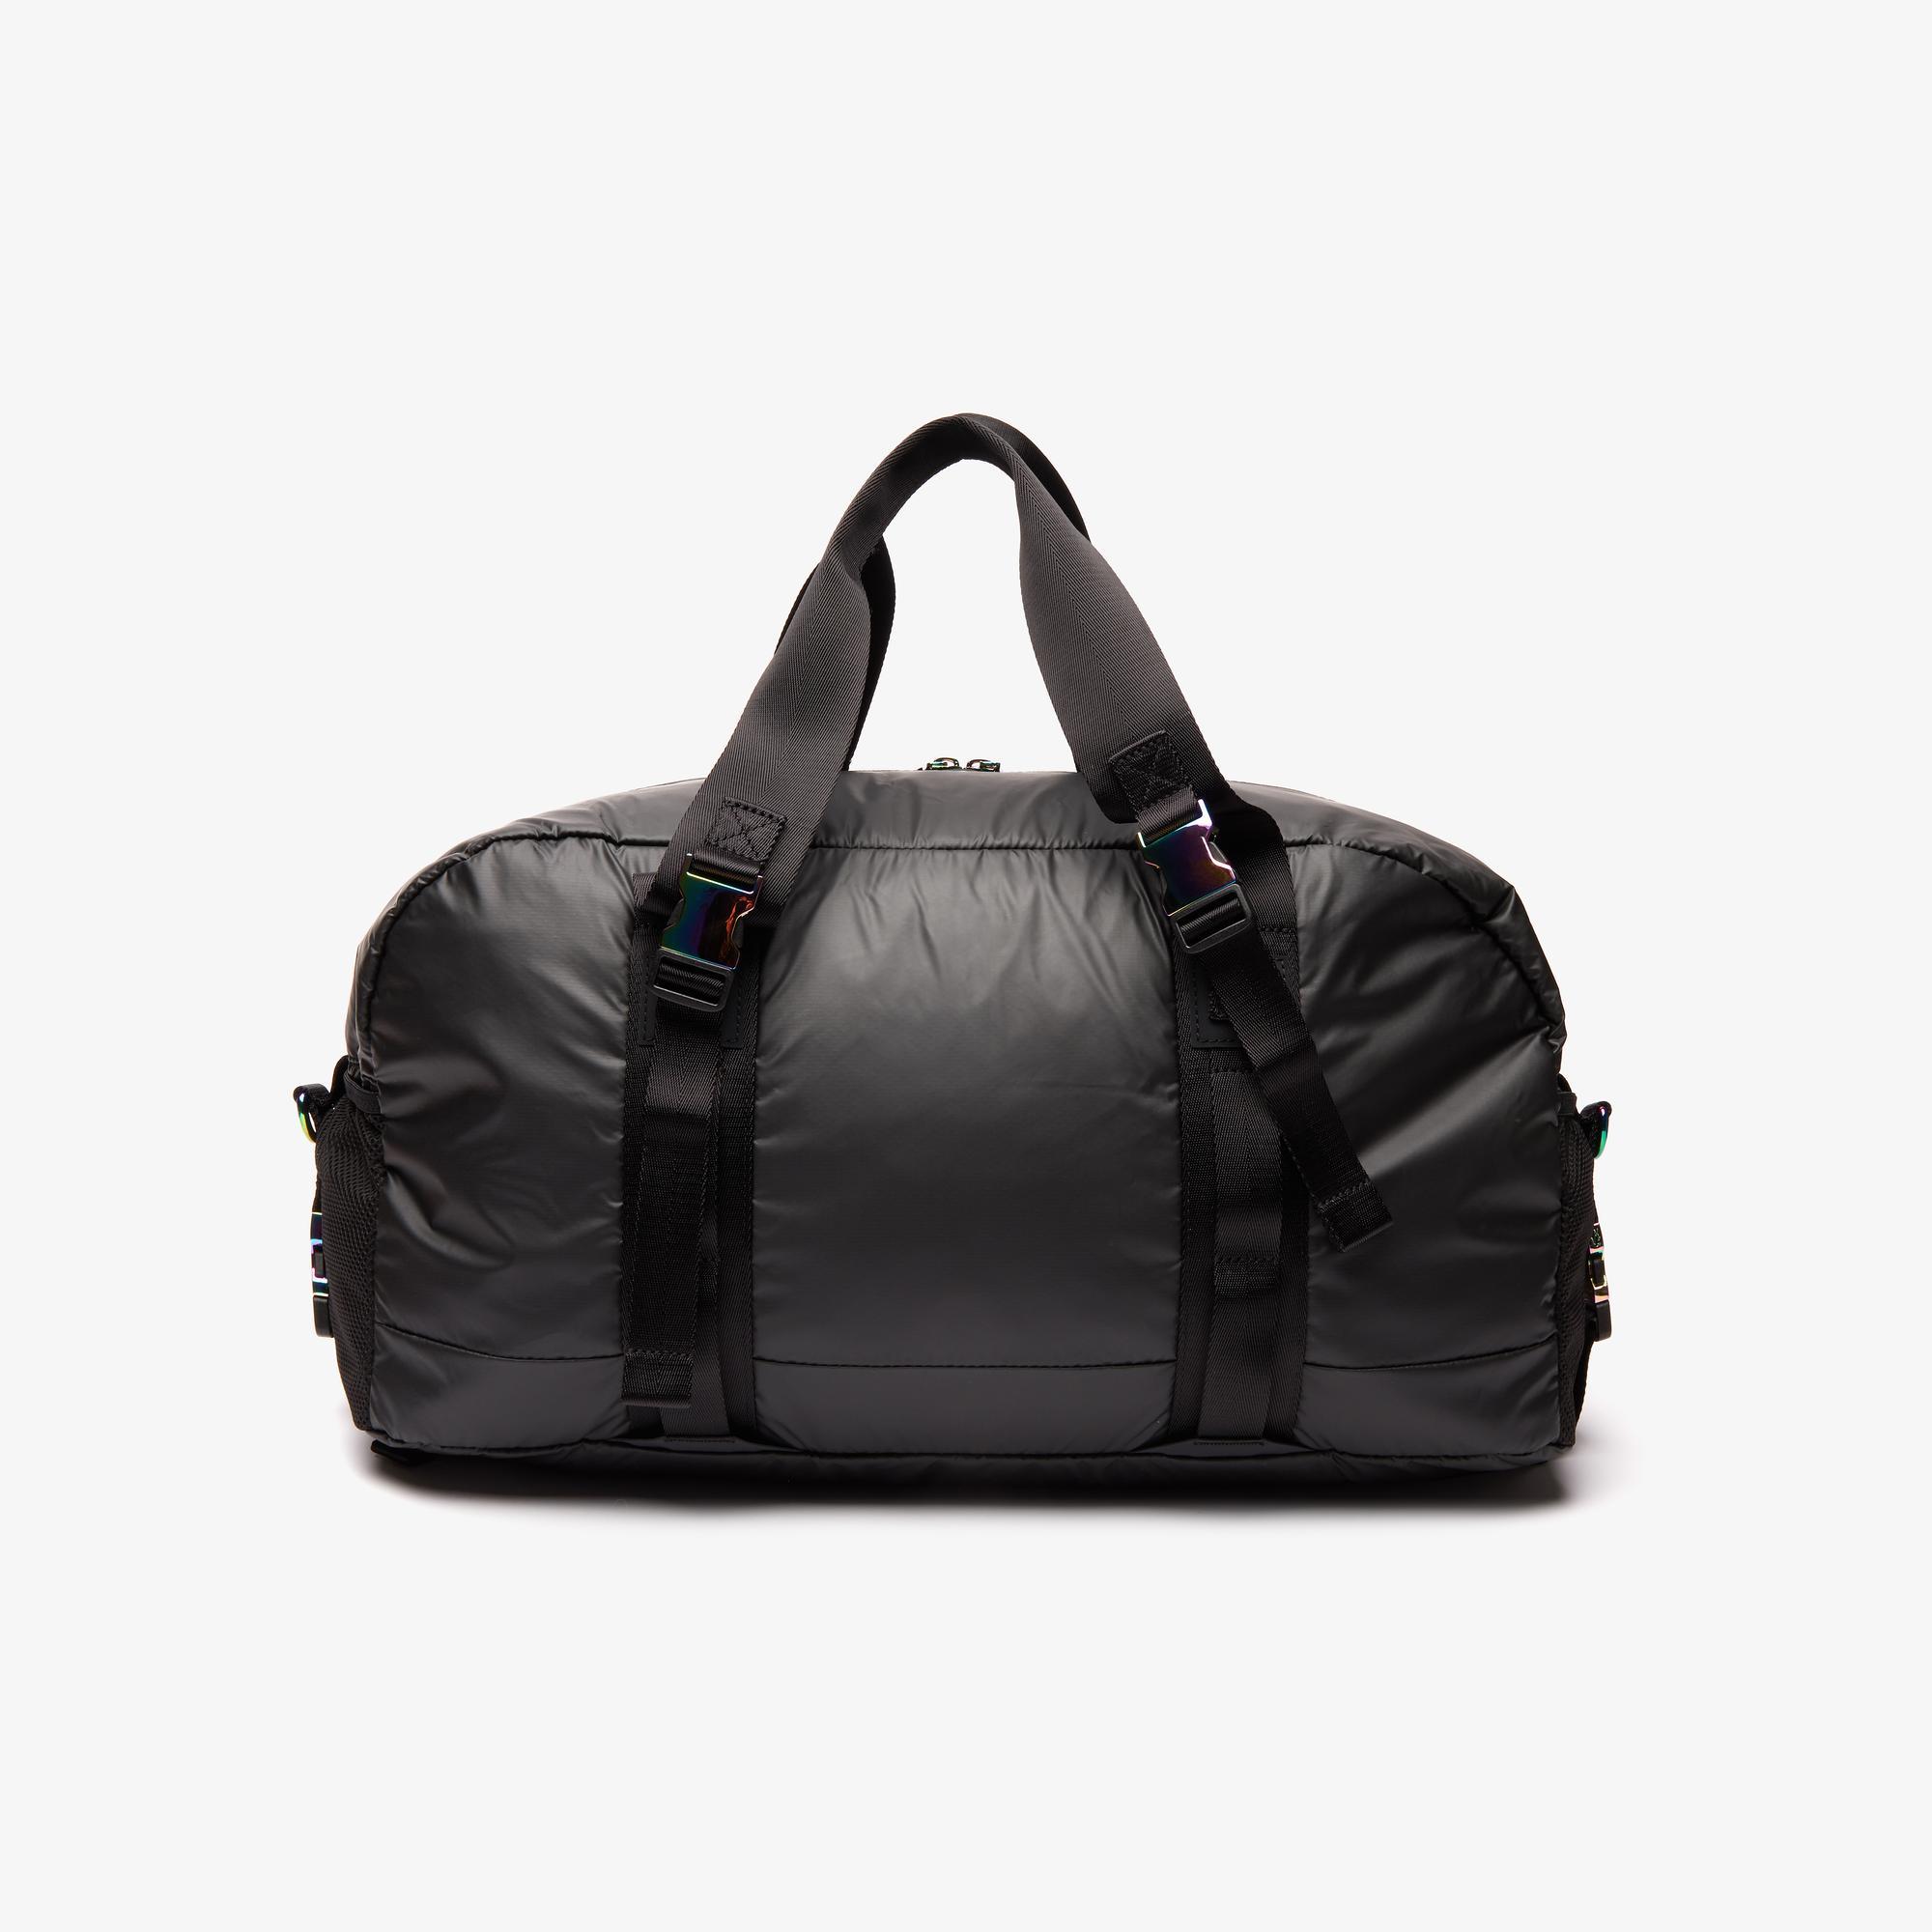 Lacoste сумка чоловіча на блискавці